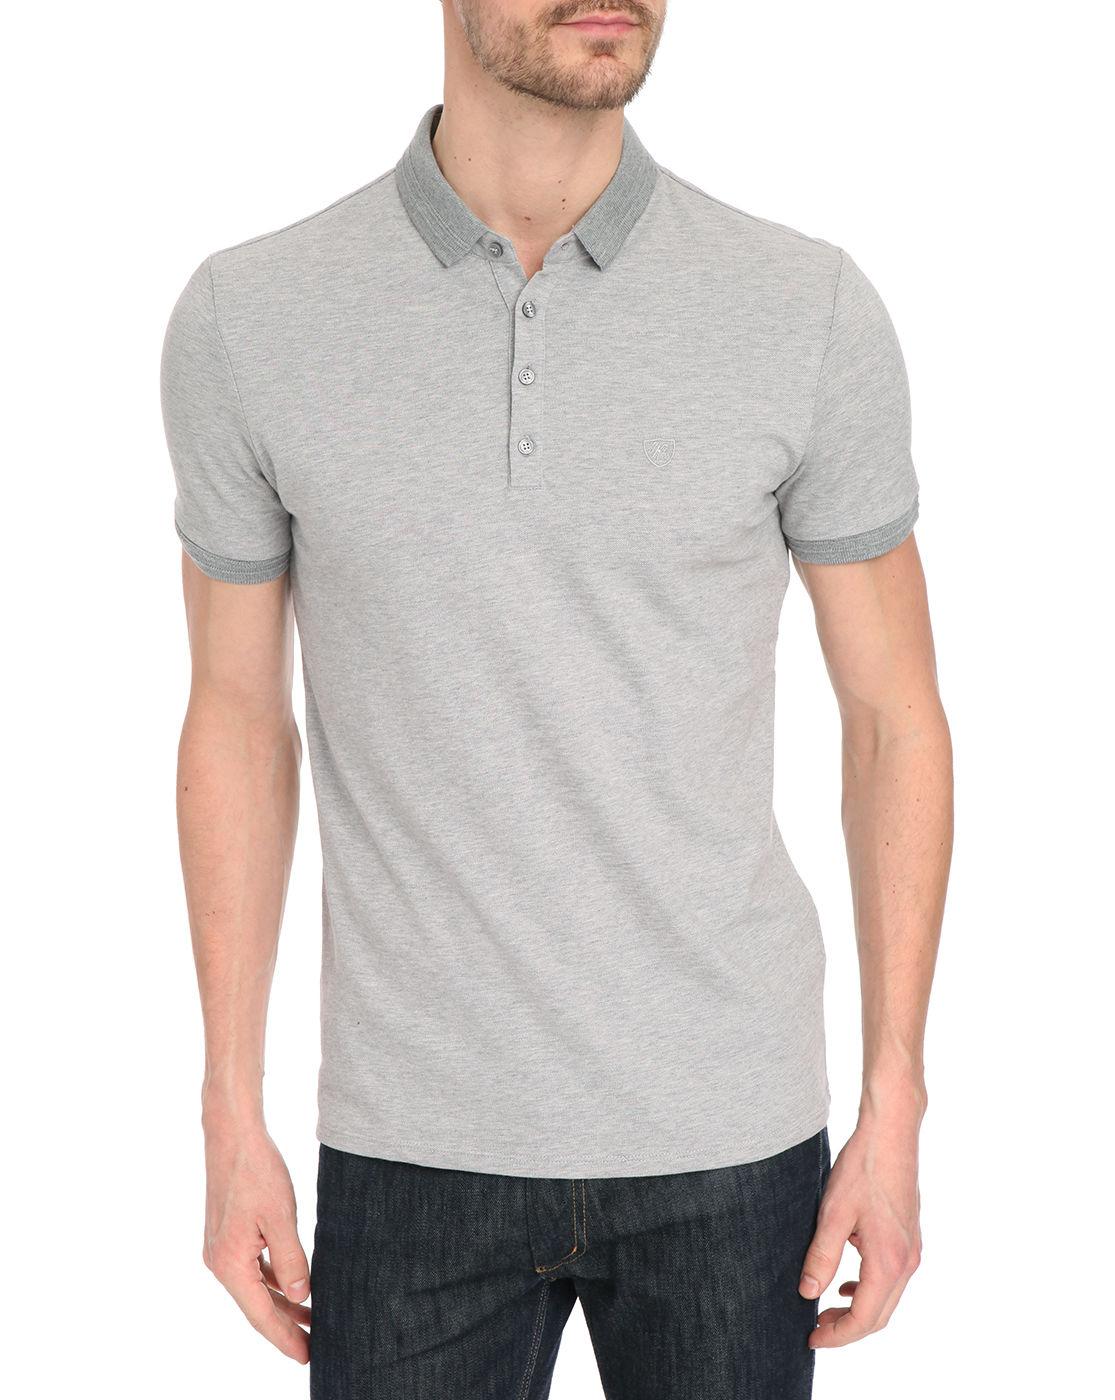 ikks mottled grey basic polo shirt in gray for men grey lyst. Black Bedroom Furniture Sets. Home Design Ideas